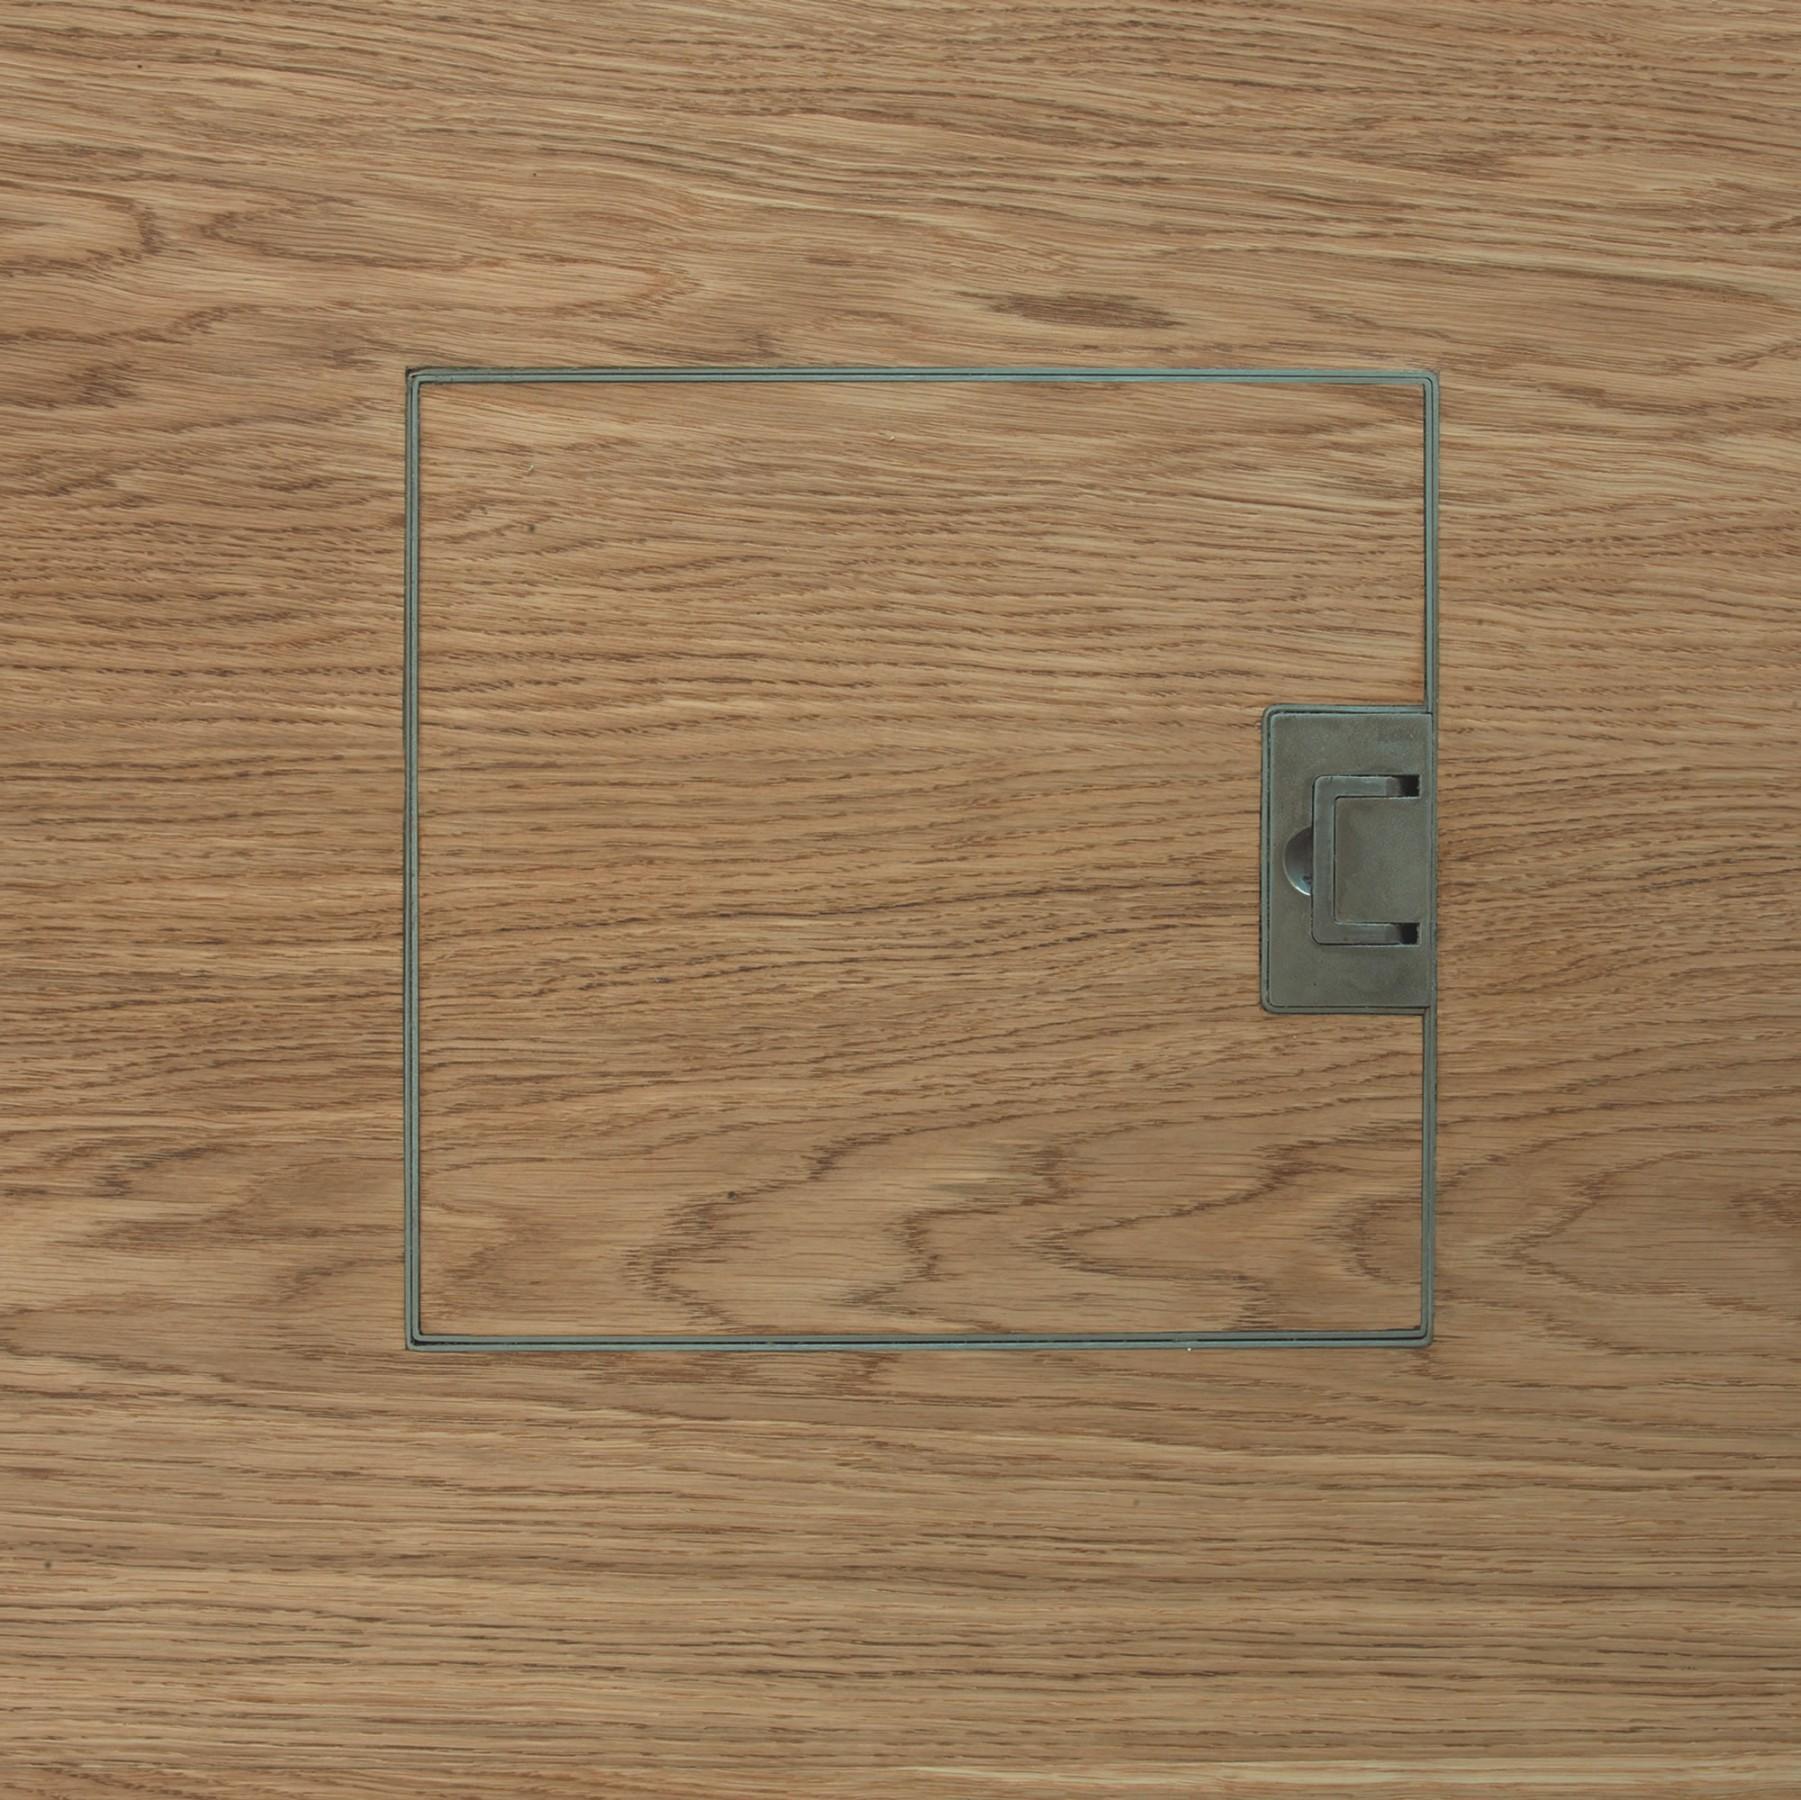 Electrical floor socket | Grain end matched | Element 7